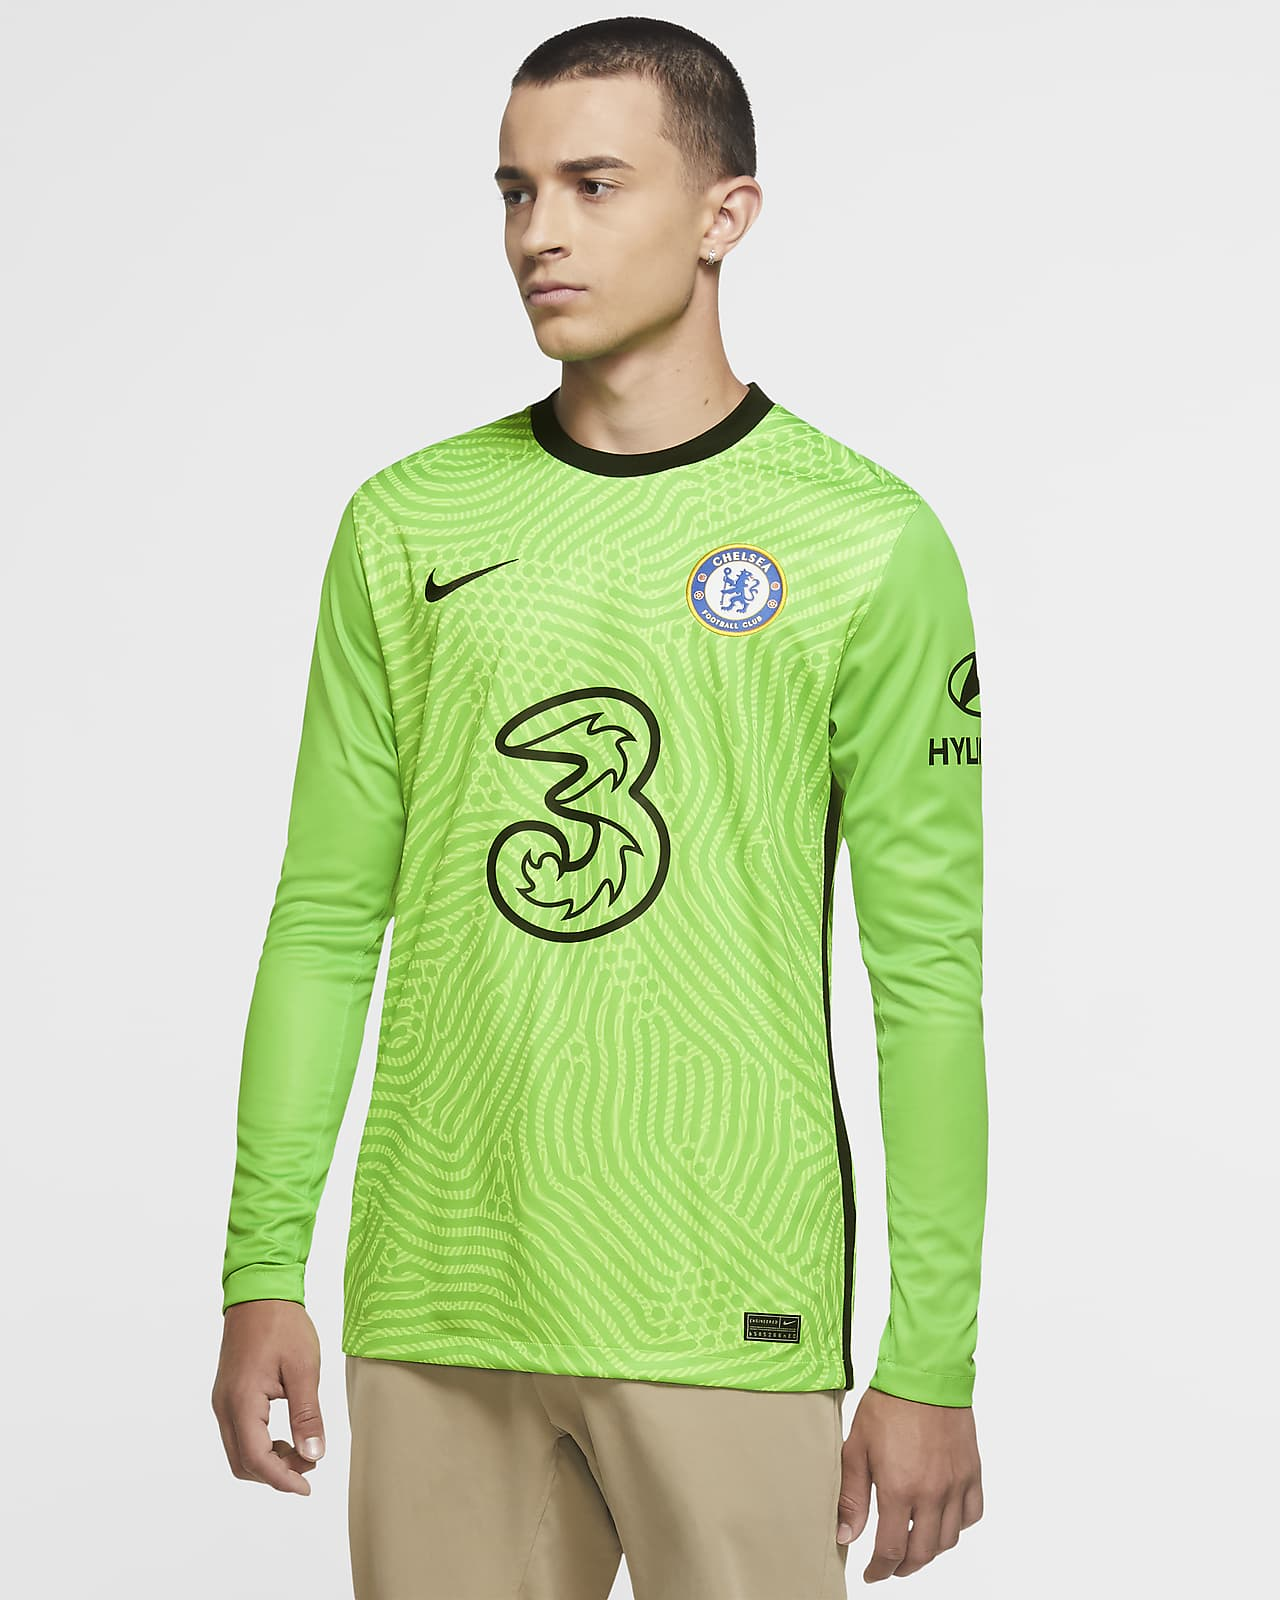 Maillot de football Chelsea FC 2020/21 Stadium Goalkeeper pour Homme